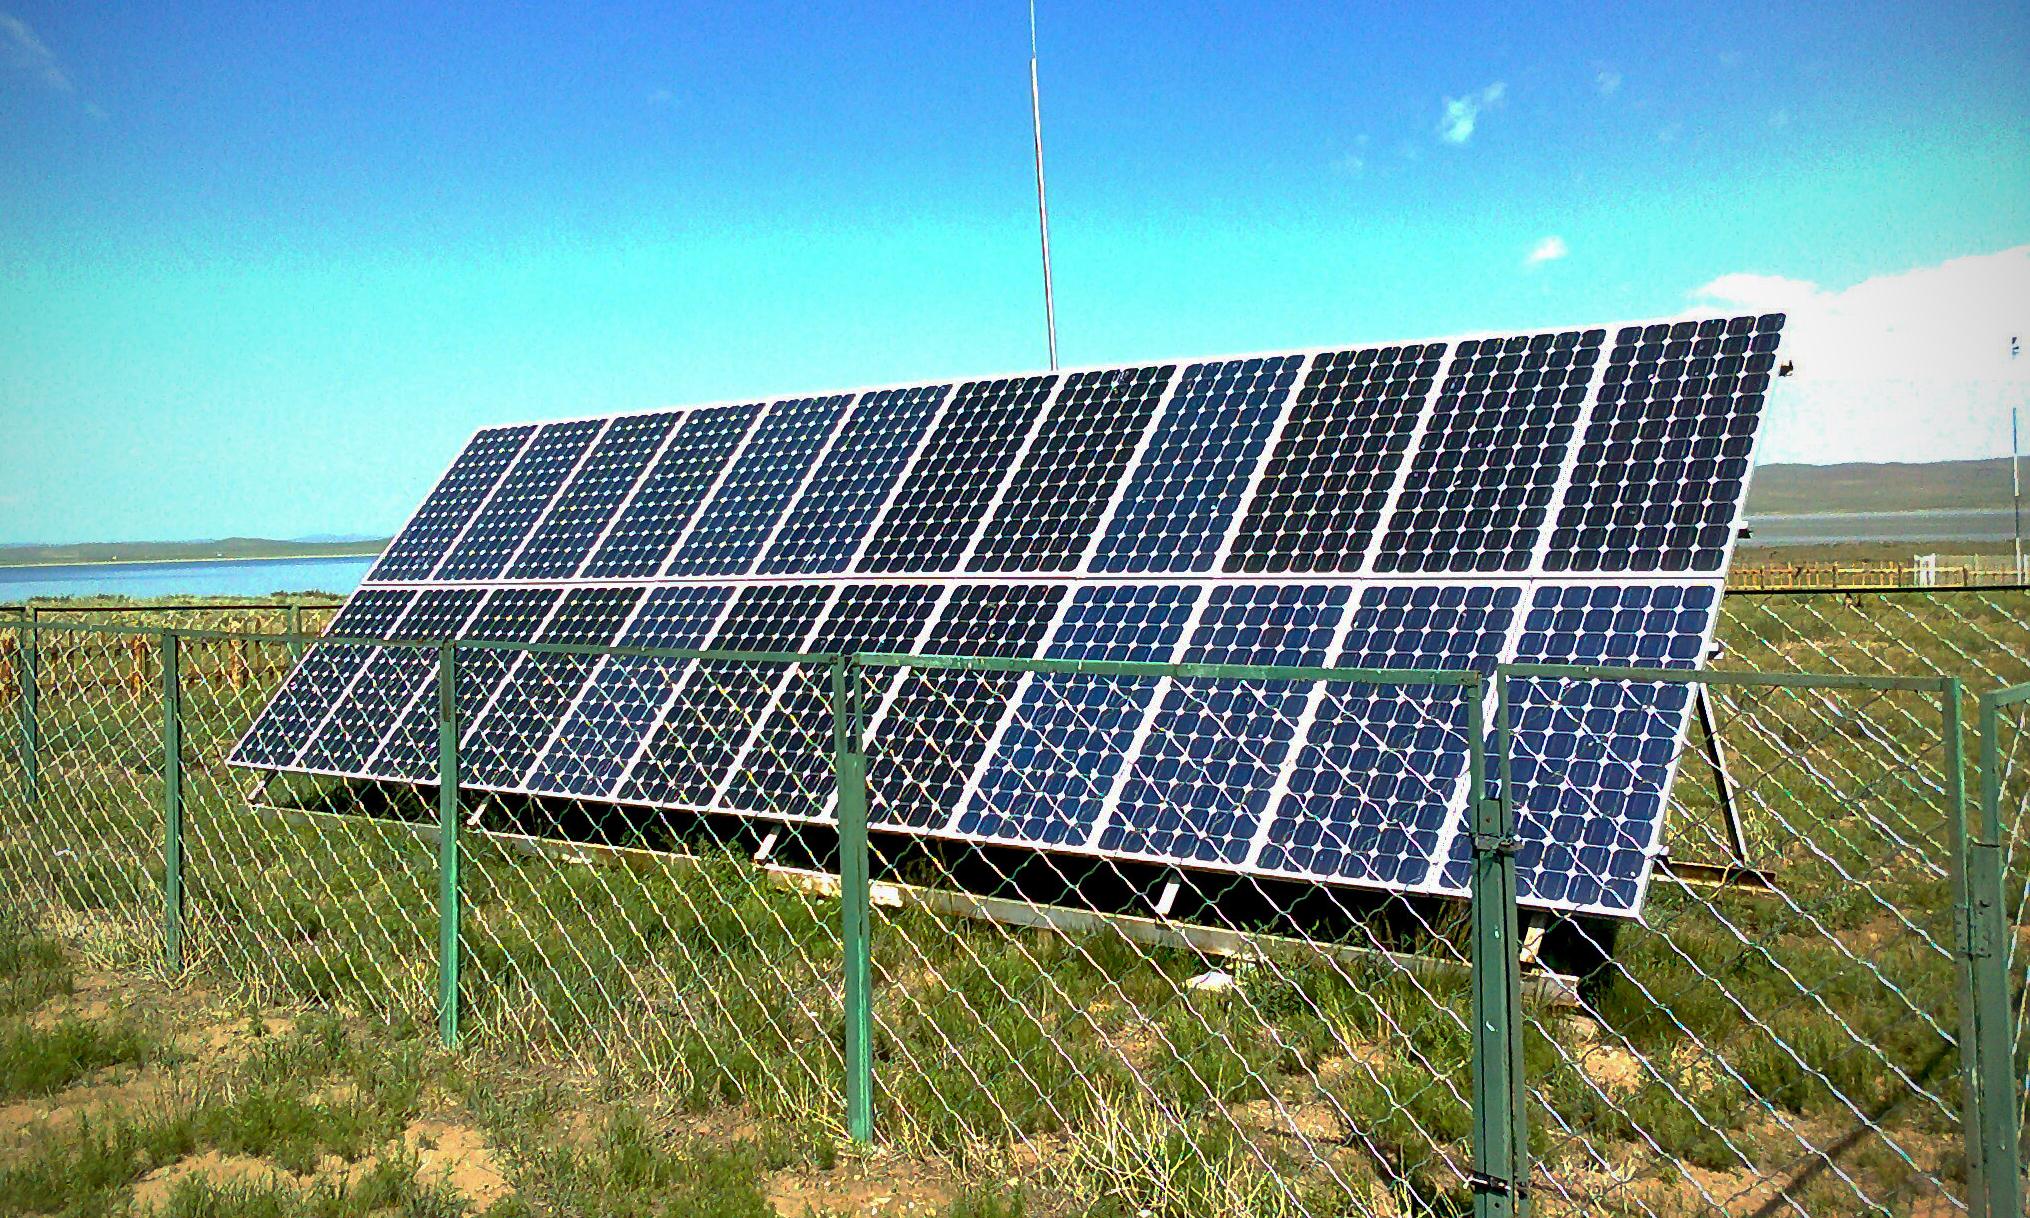 Nano Dimension Supplies Dragonfly 2020 To Solar Energy Company